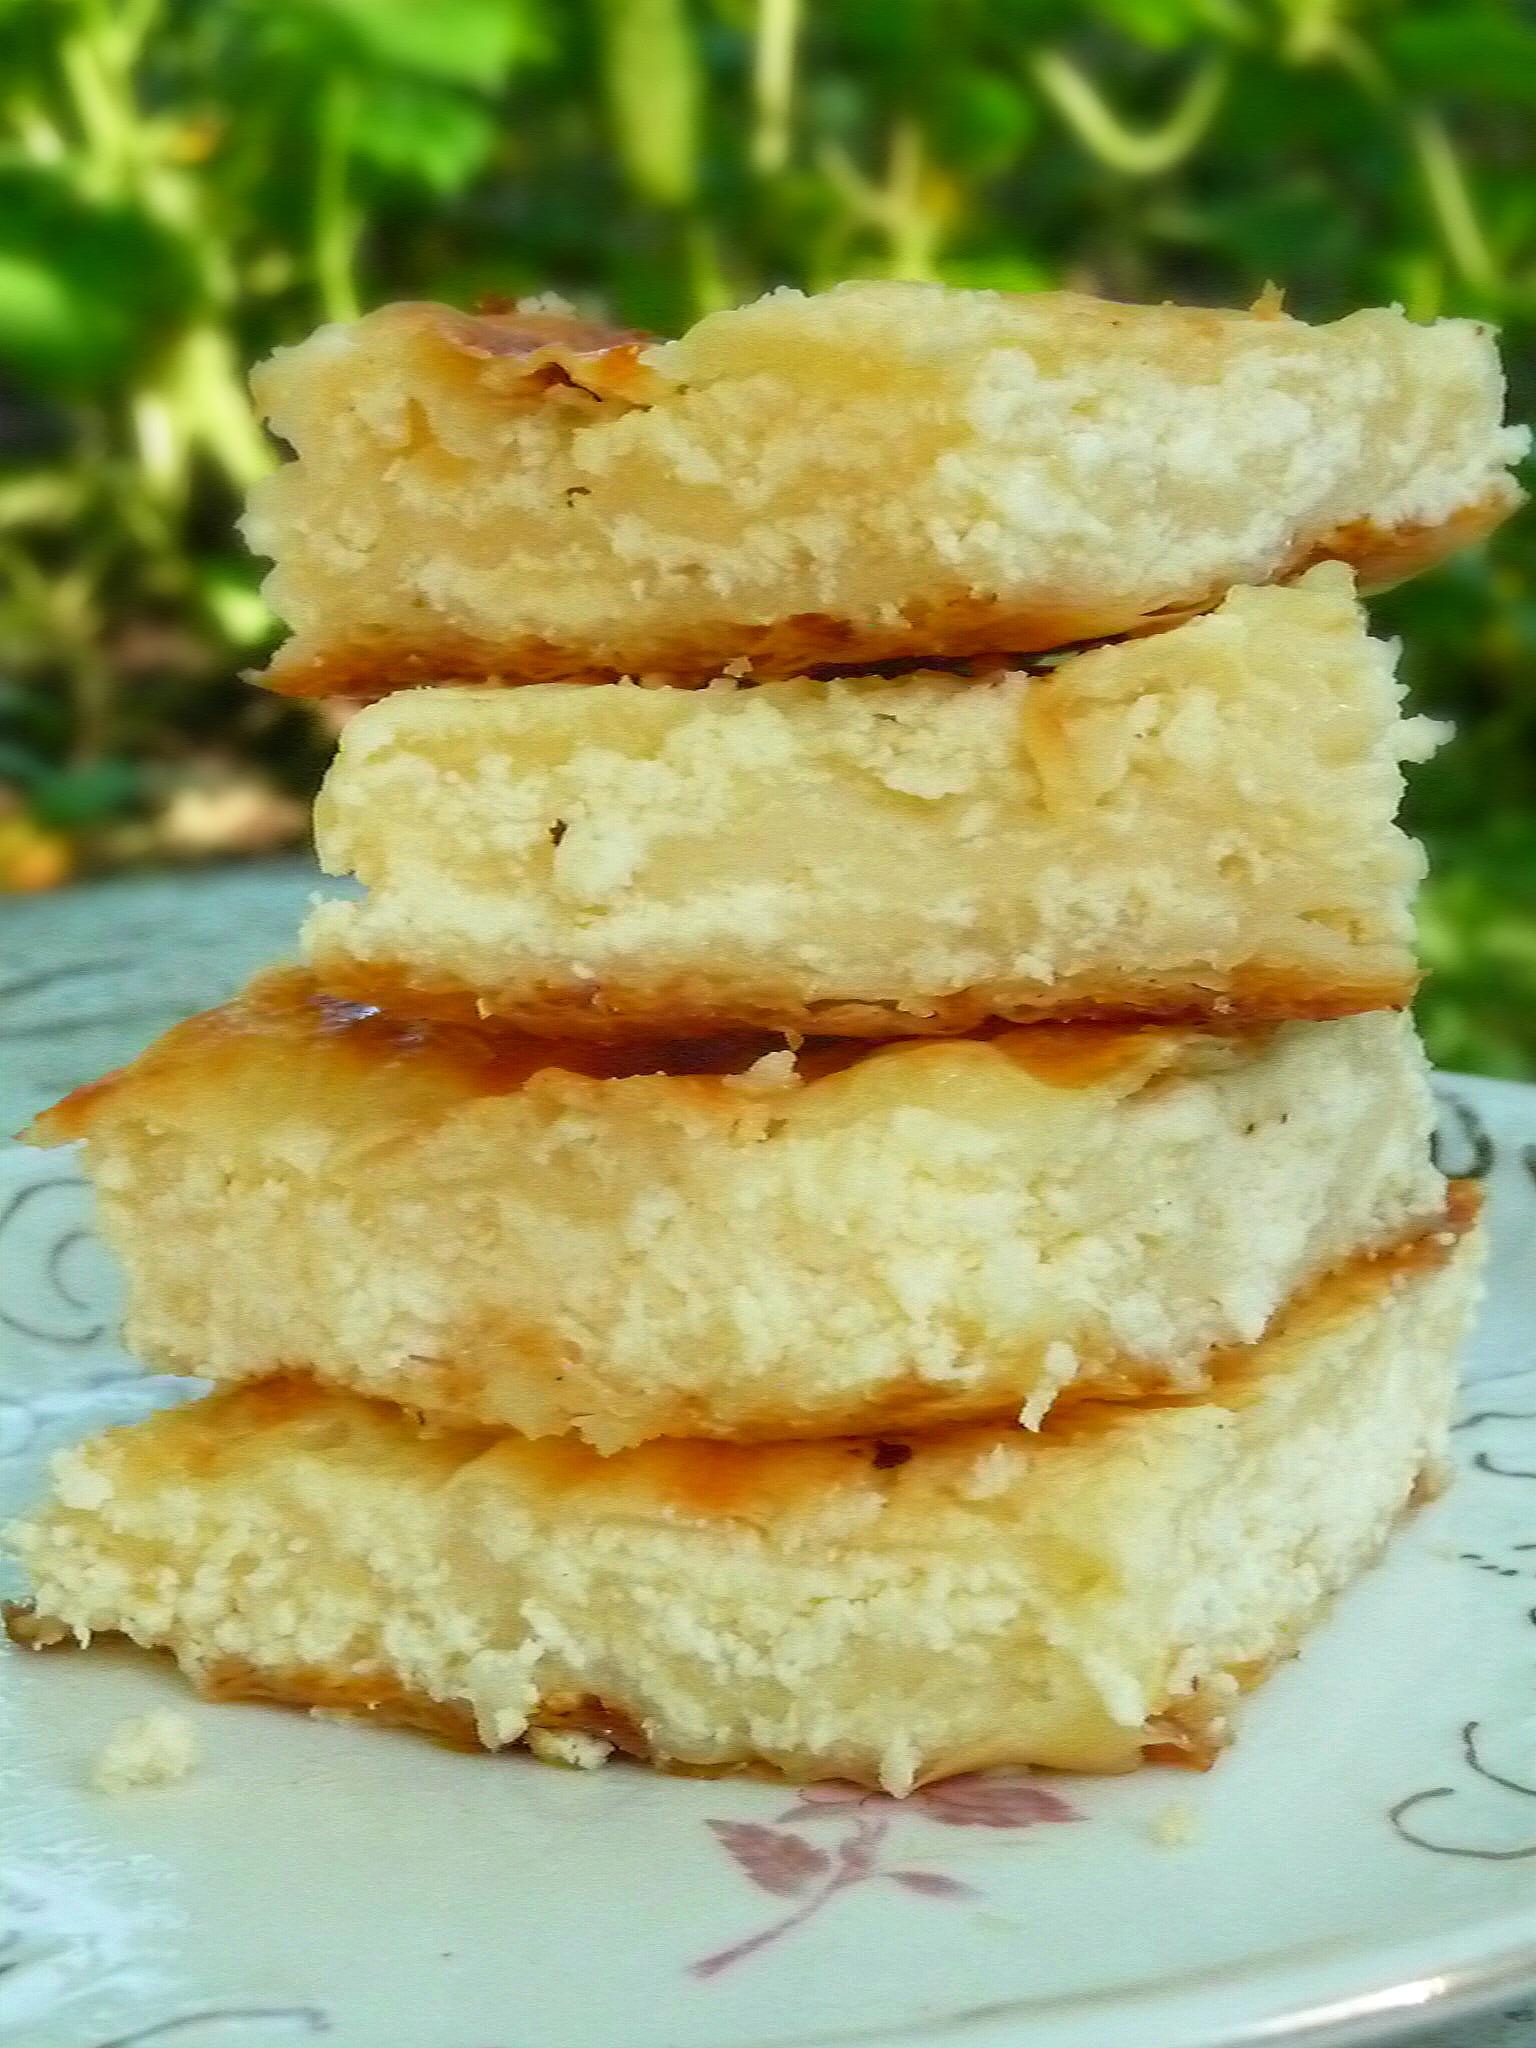 Super easy Homemade Cheese Pie recipe